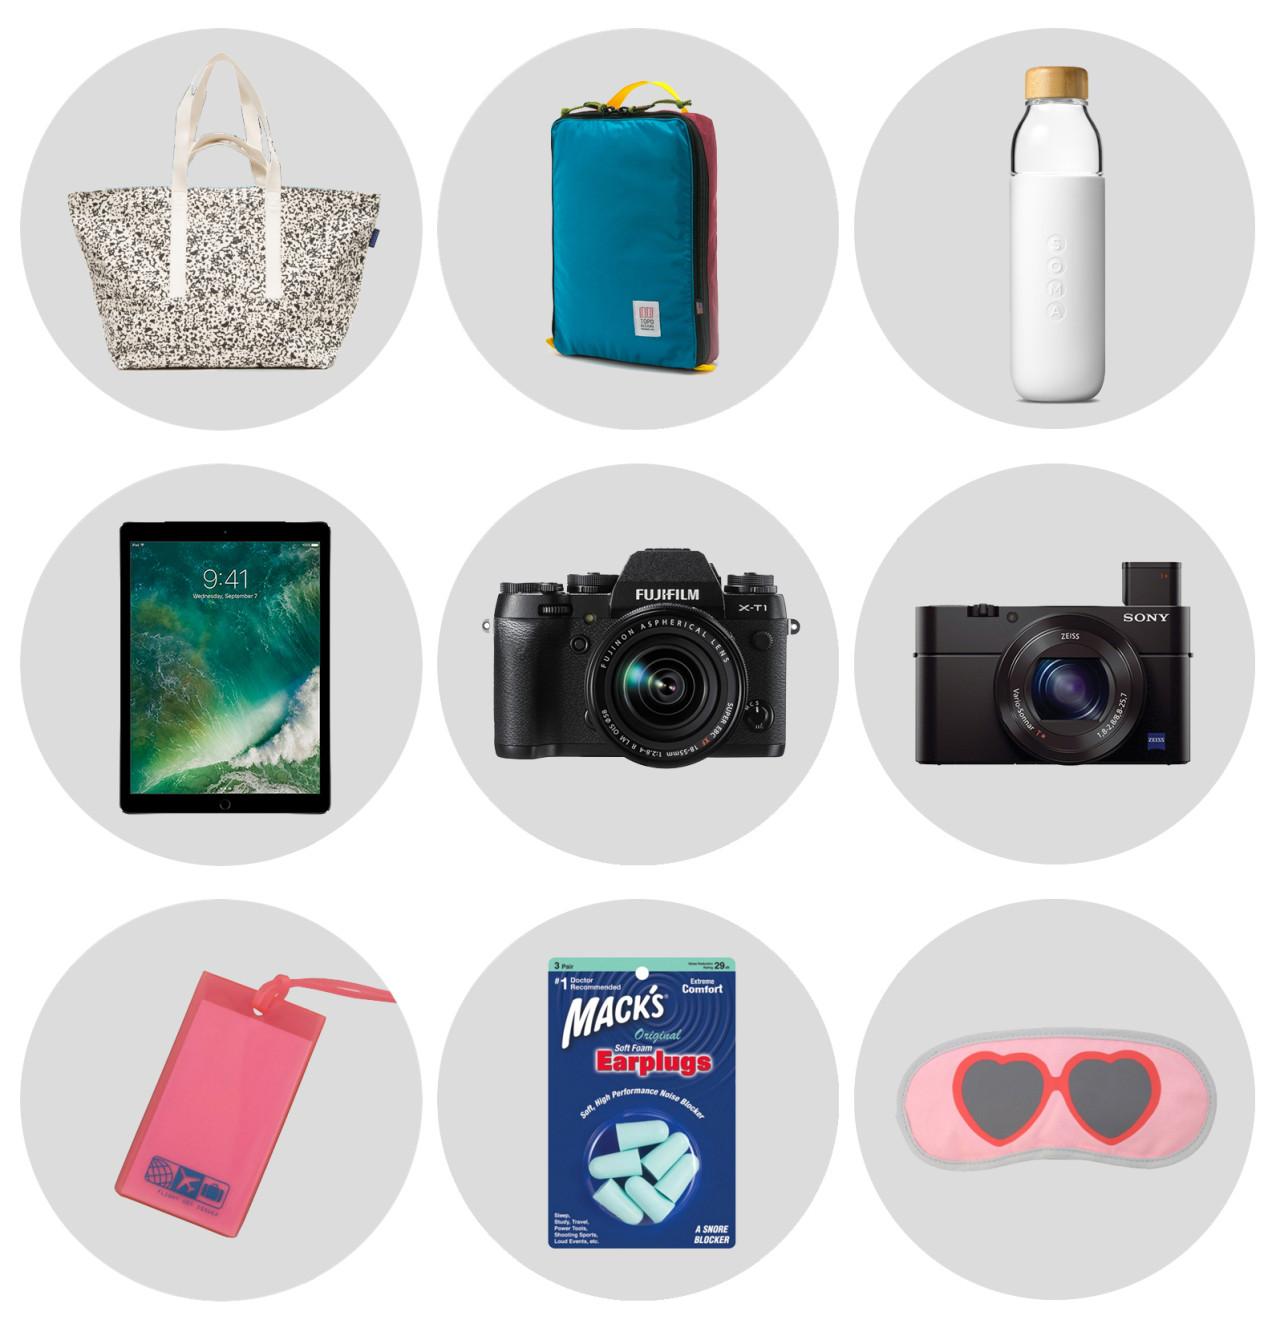 Travel Accessories Roundup: The Design Milk Team Edition